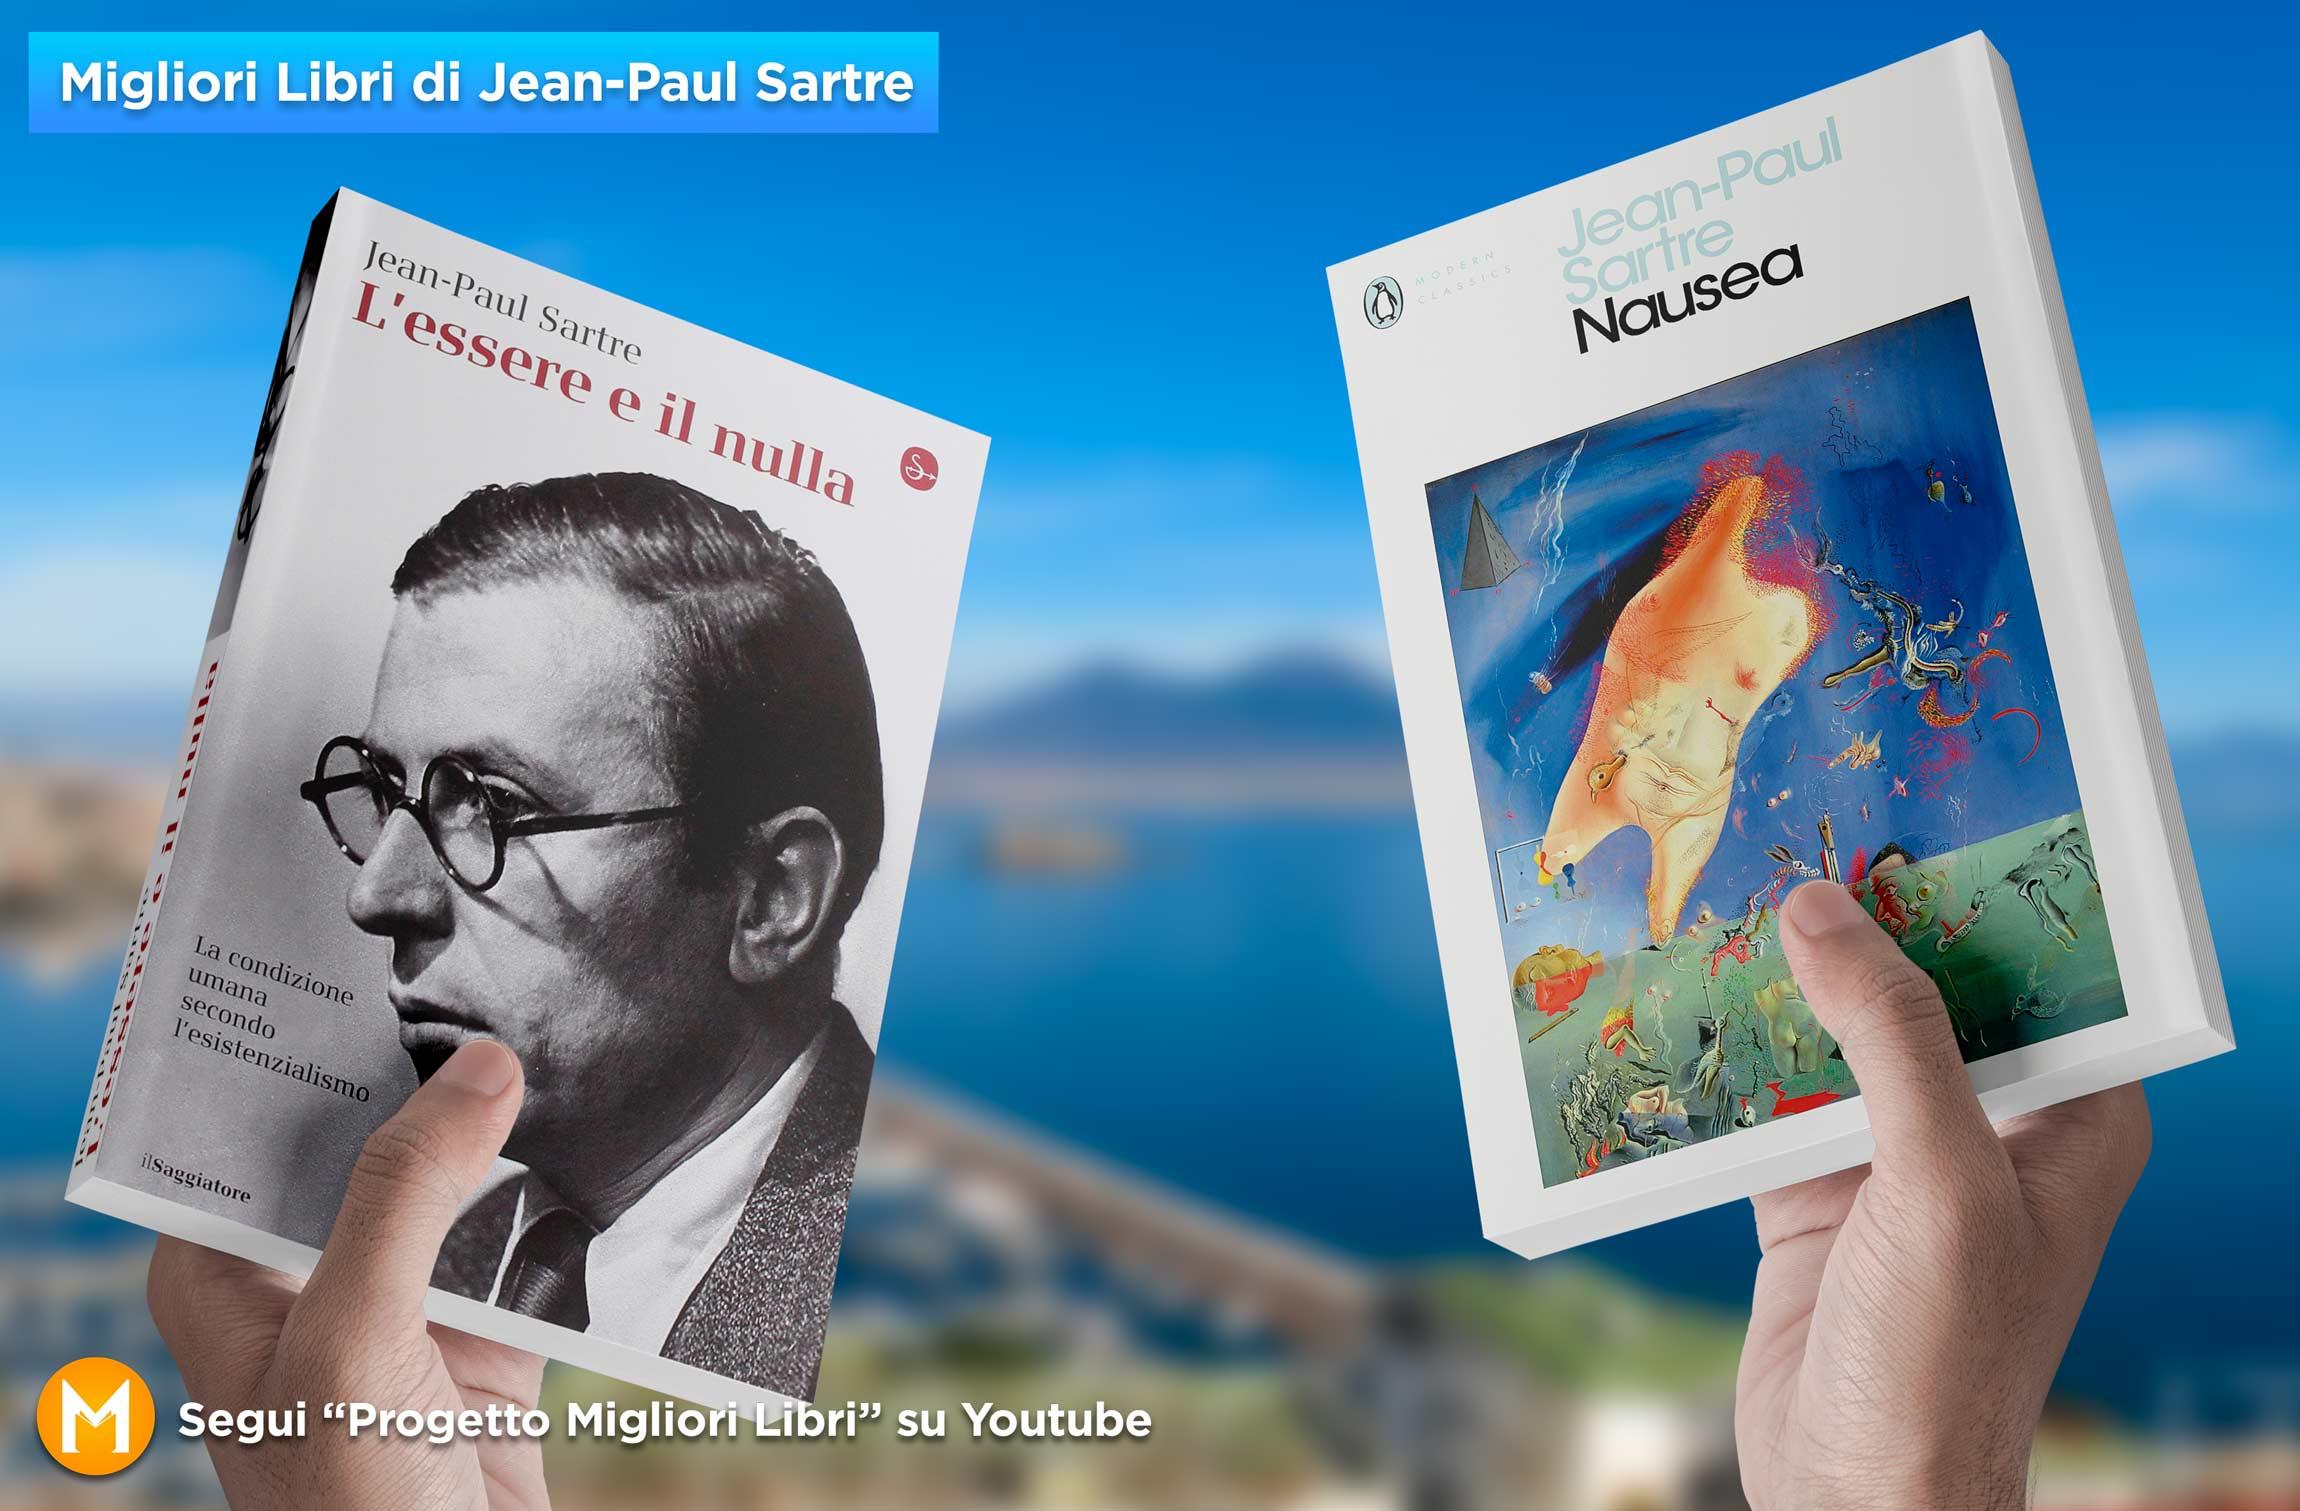 migliori-libri-jean-paul-sartre